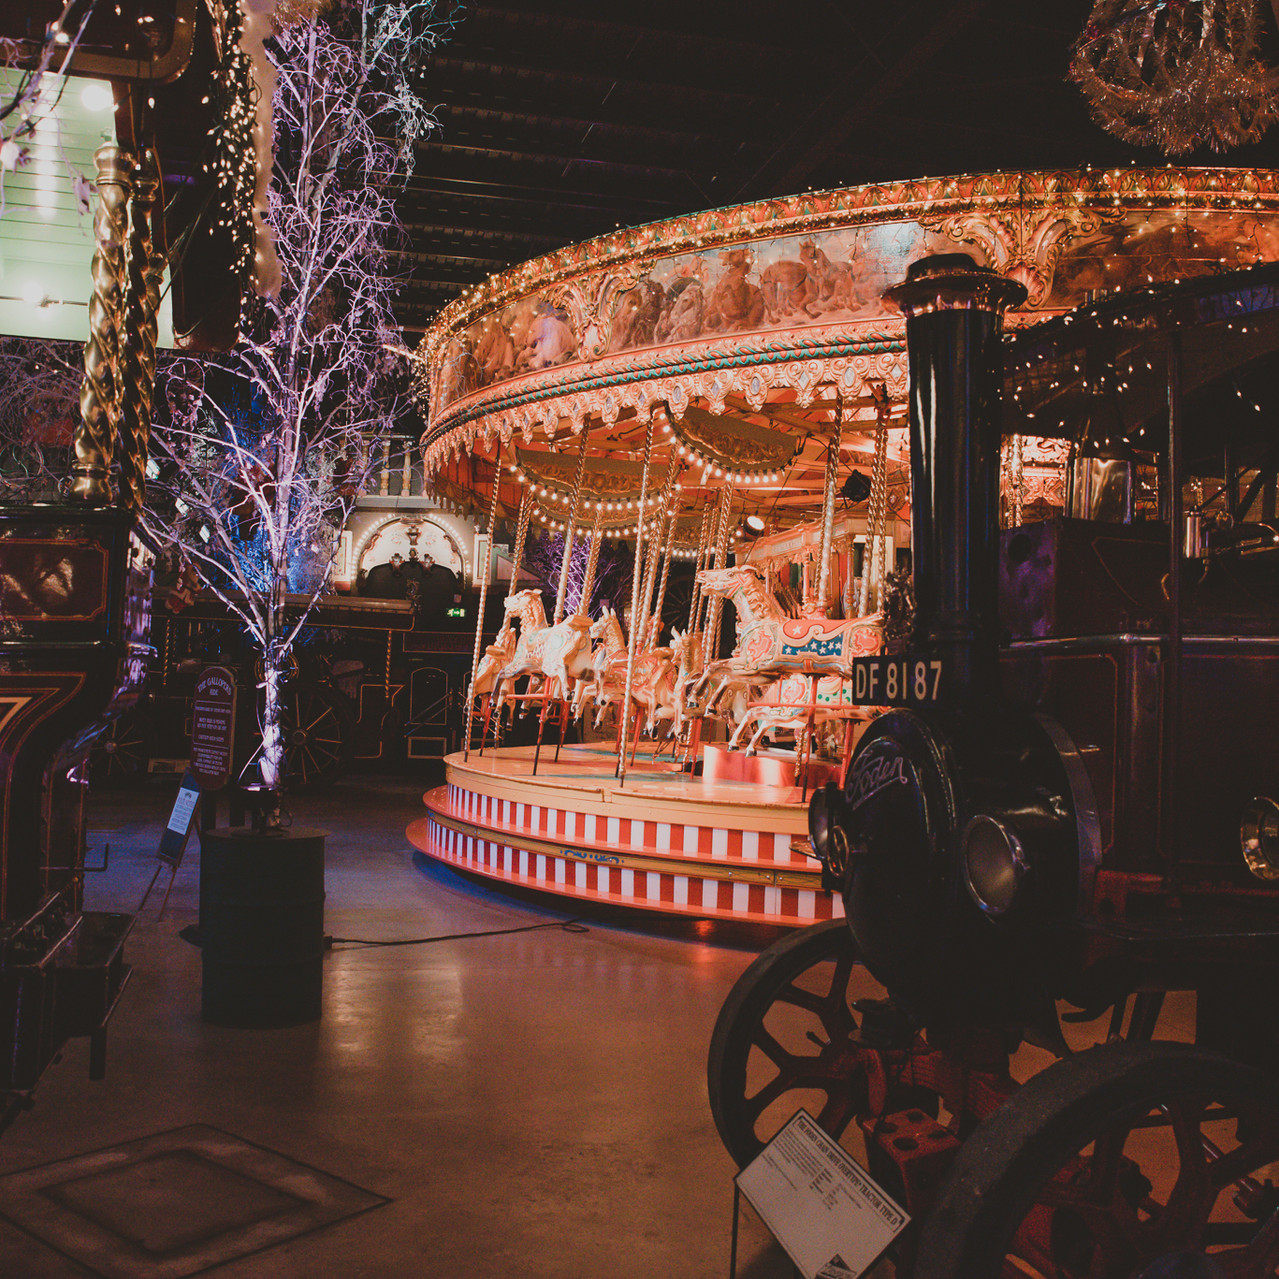 Fay Wedding - Thursford Collection at the Garden Pavilion, Norfolk. Carousel